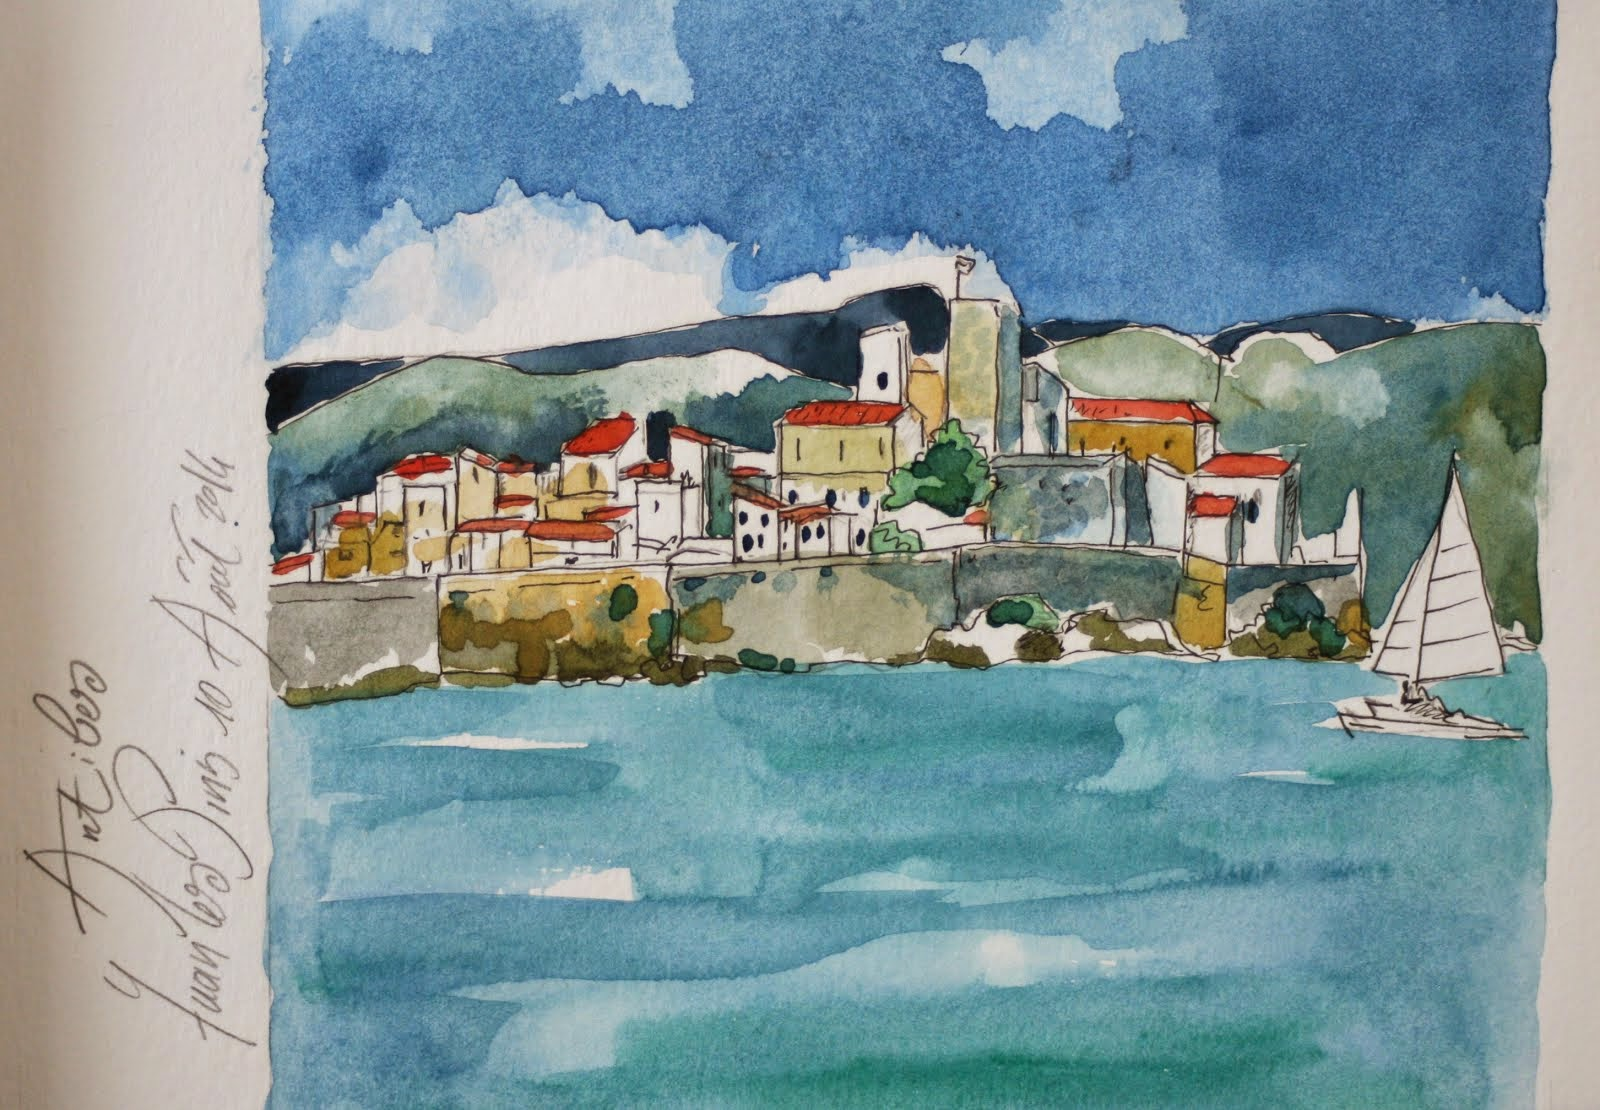 Carnet de voyage, Antibes